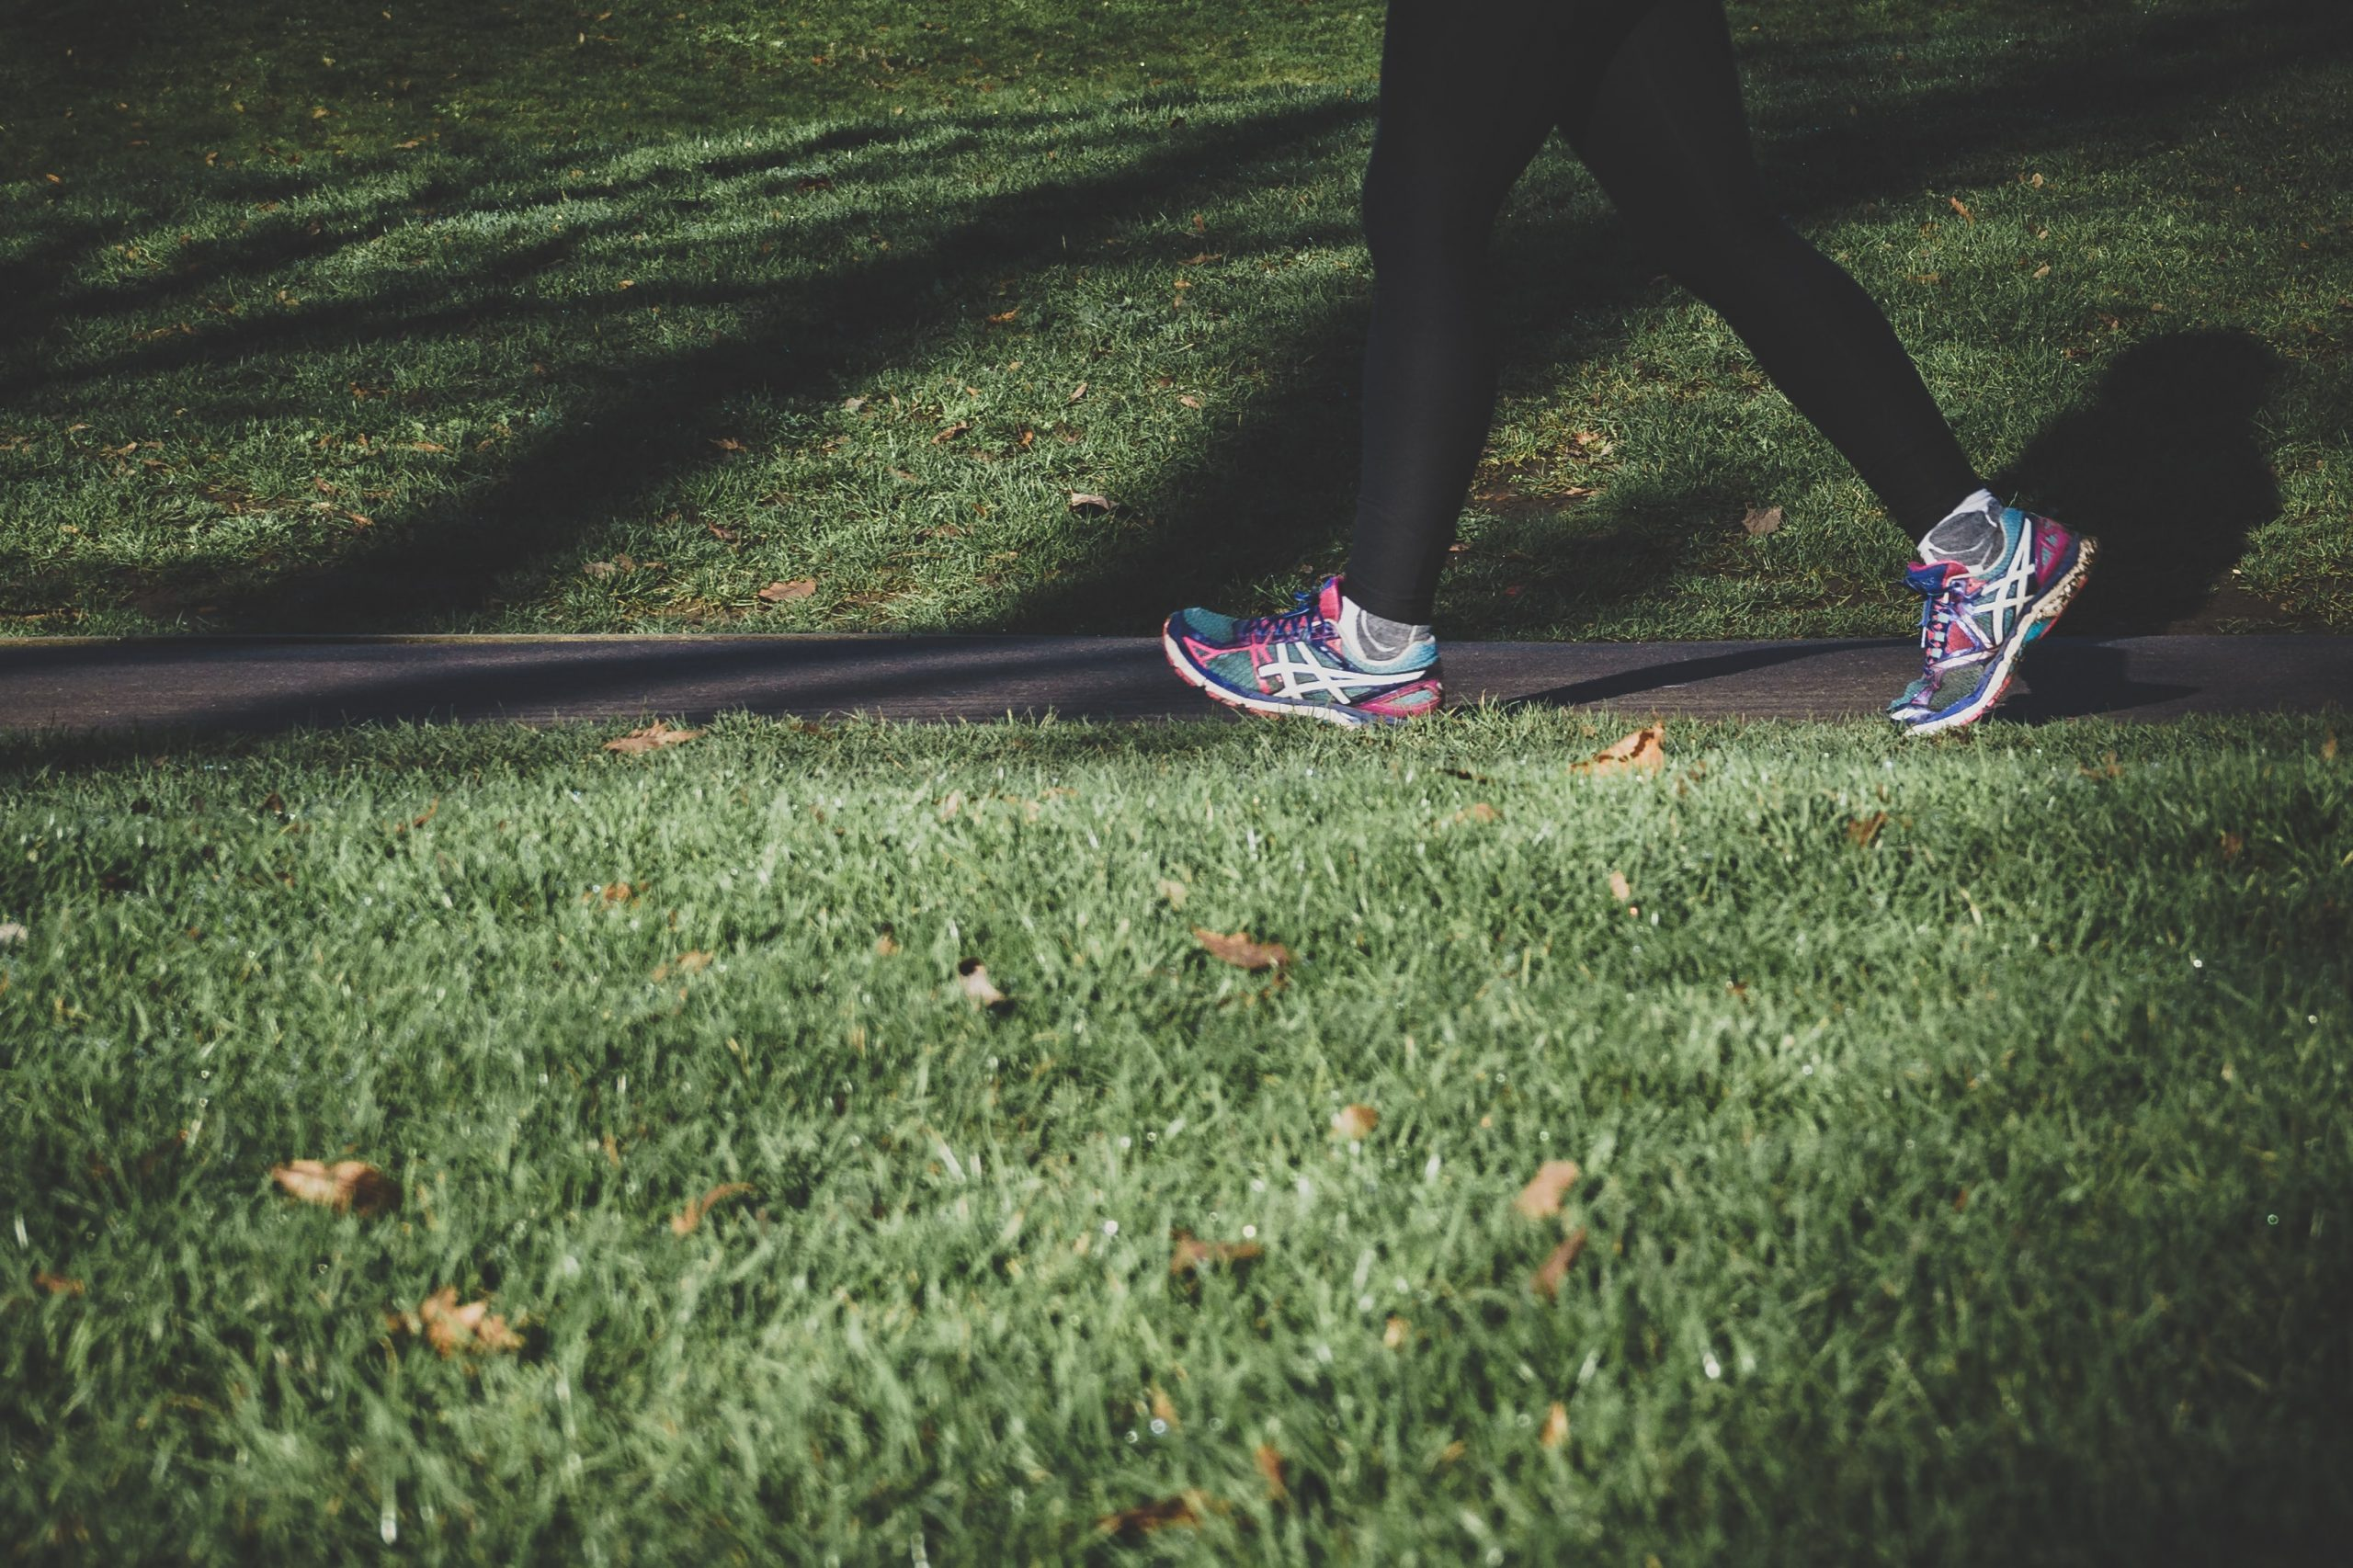 Jogging fees on a path through a park